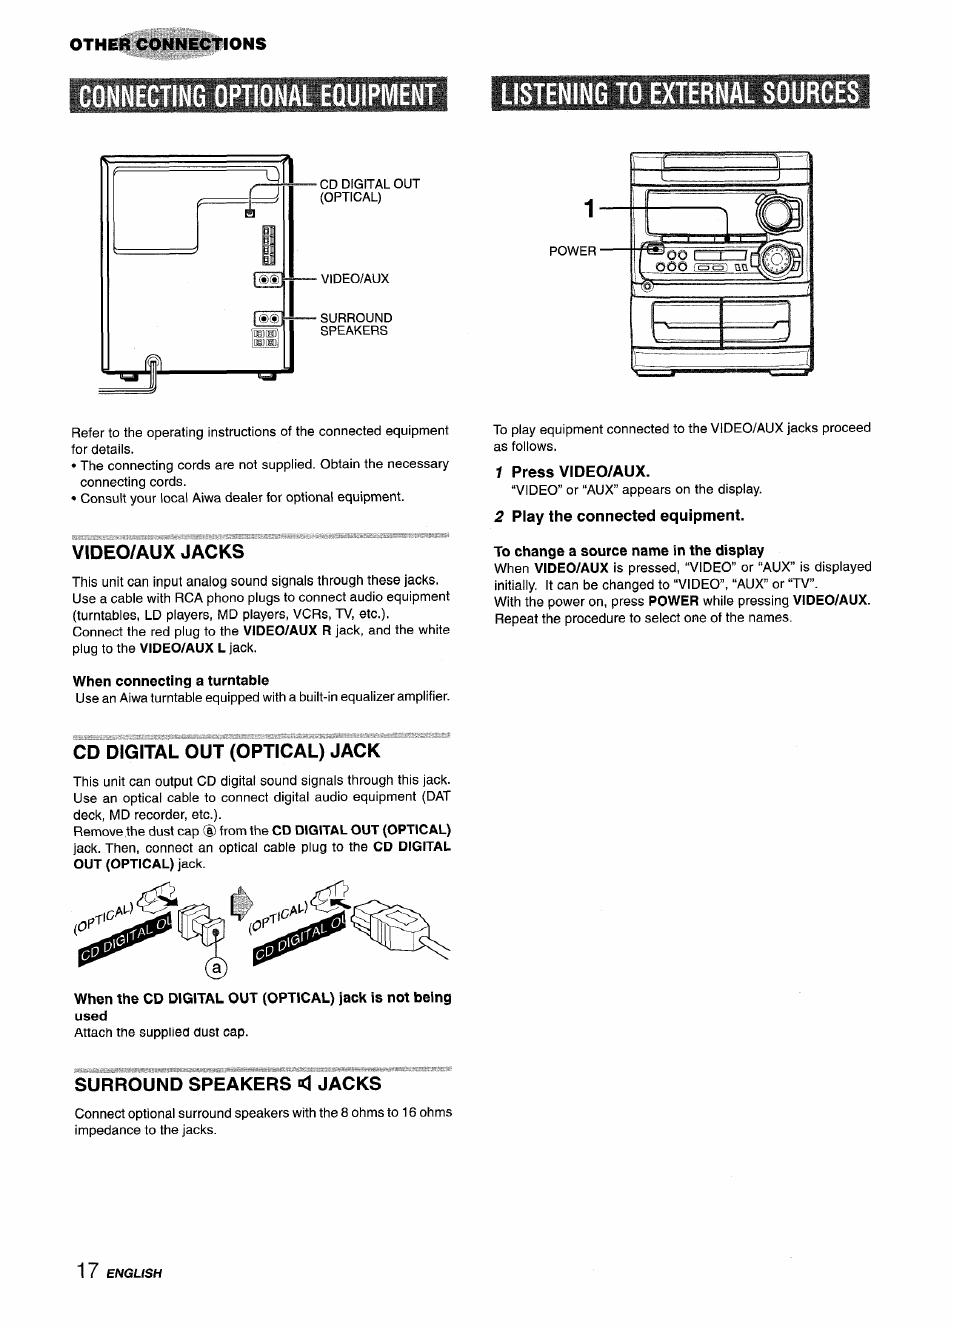 Aiwa cx-na303 manual.